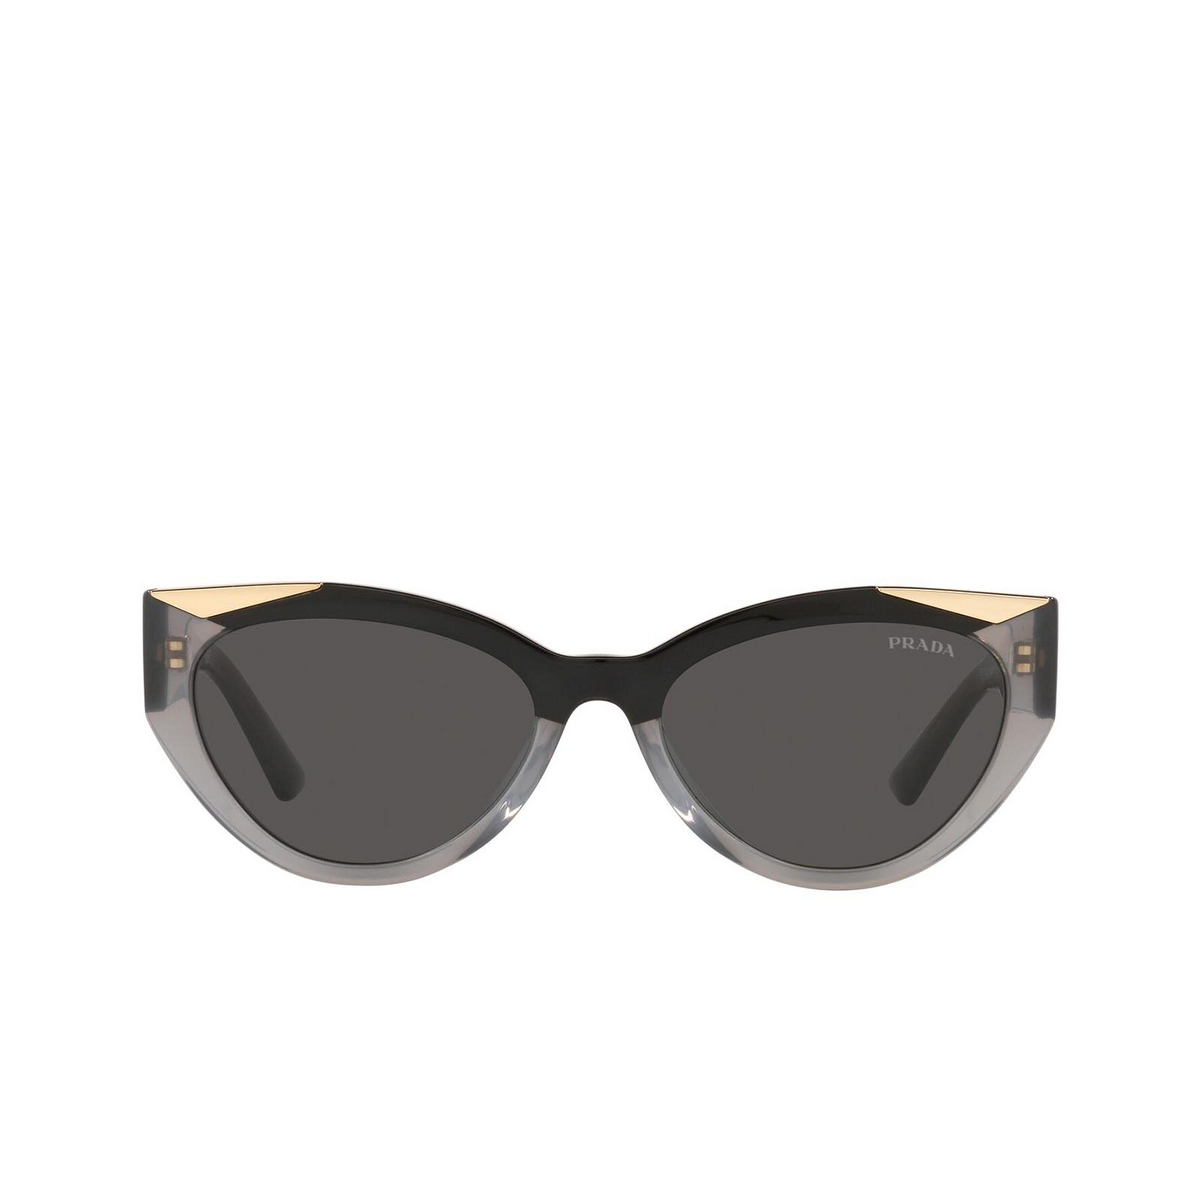 Prada® Cat-eye Sunglasses: PR 03WS color Black & Opal Grey 03M5S0.